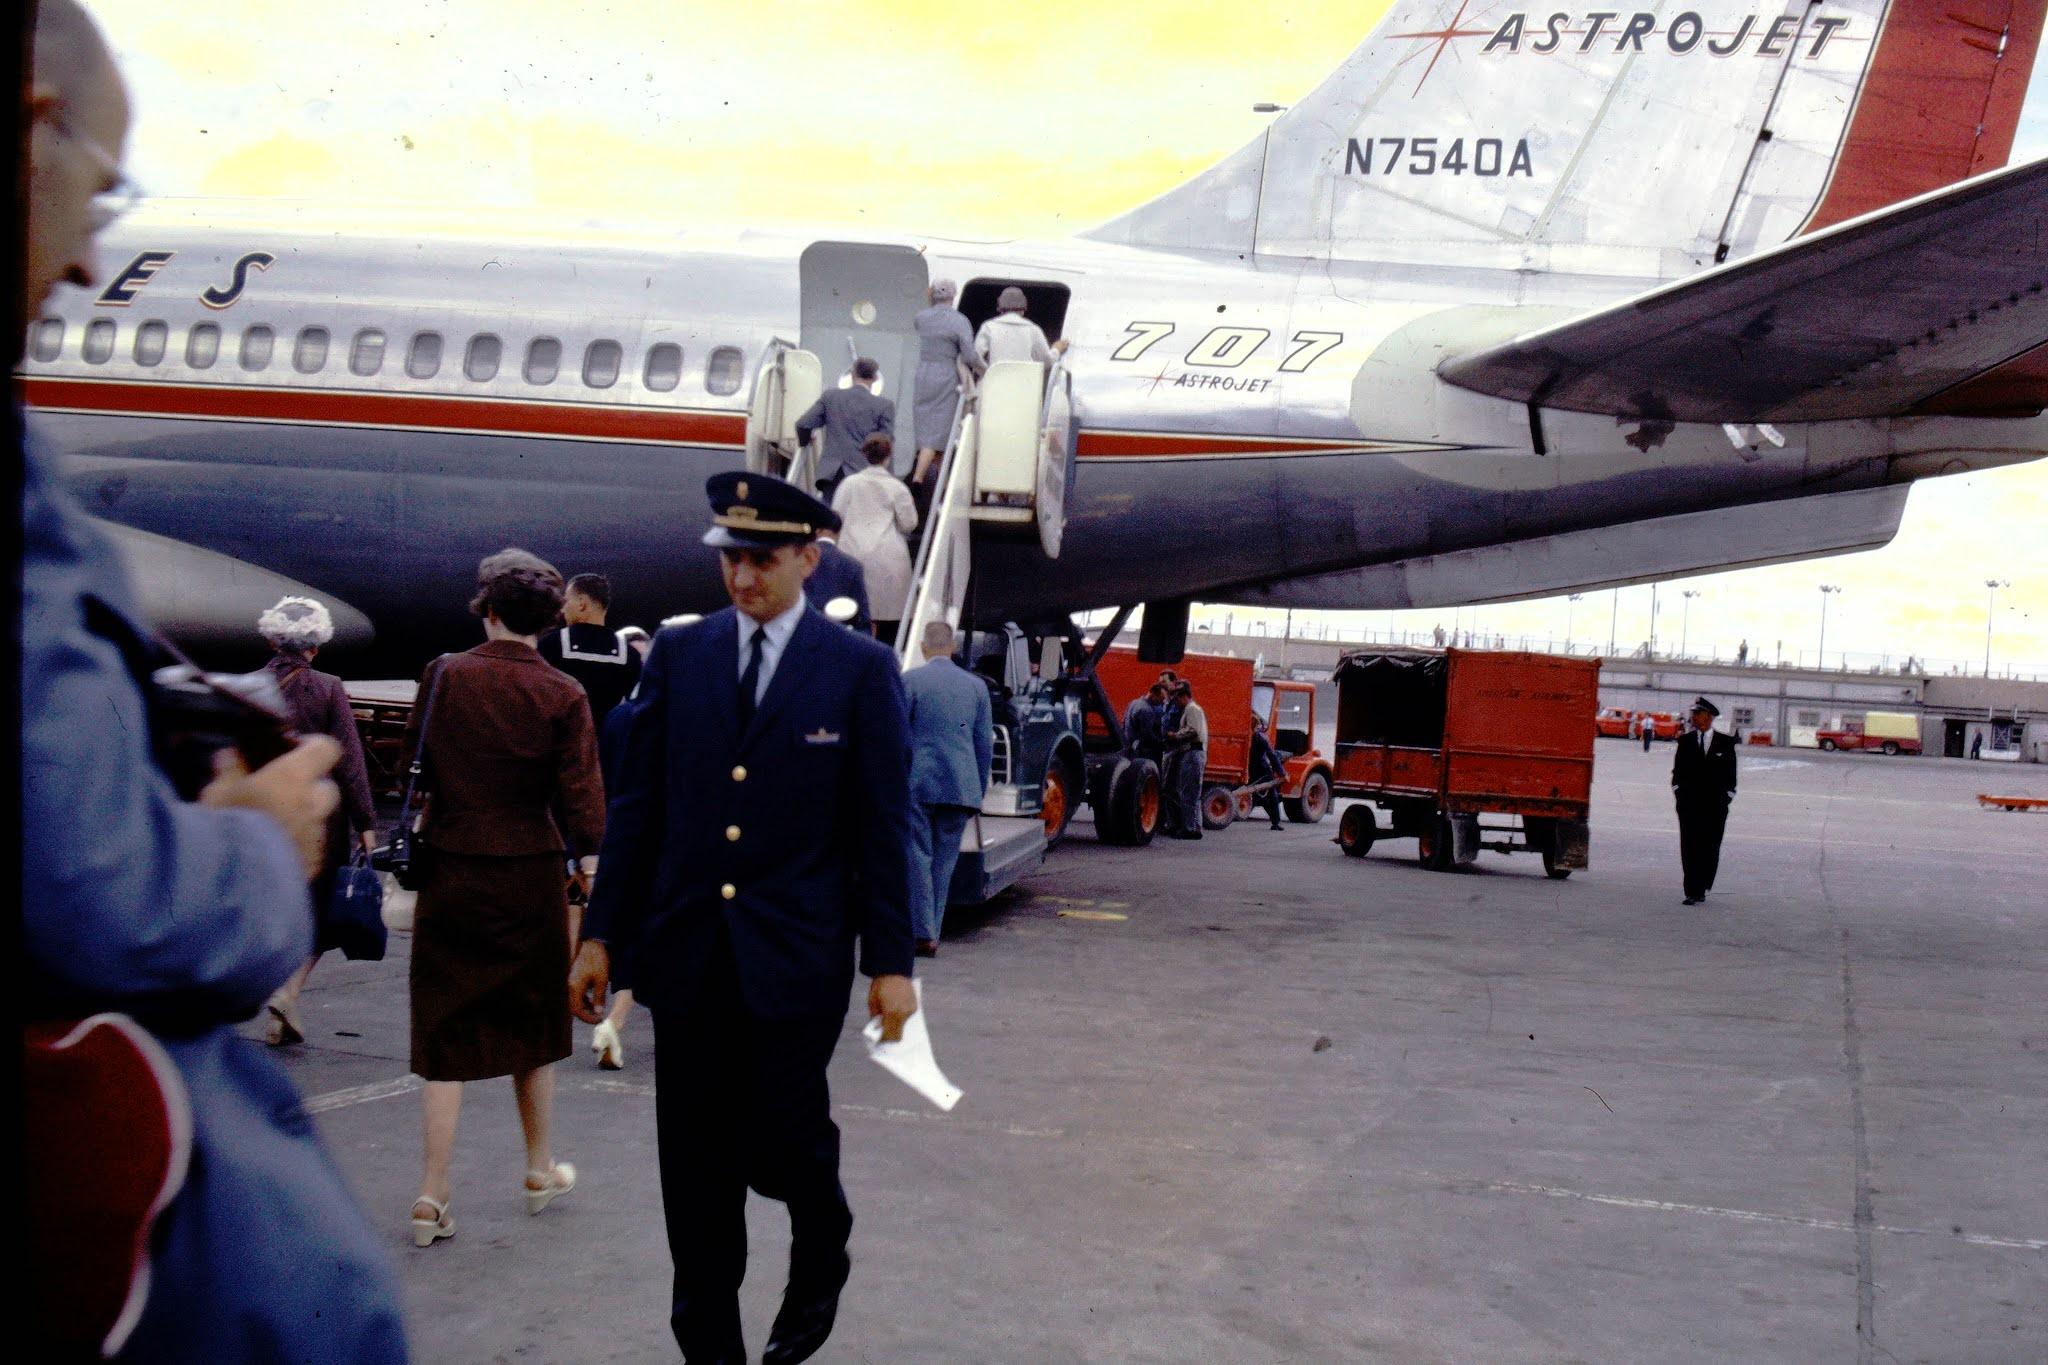 Chicago Airport - Astro Jet - 1961